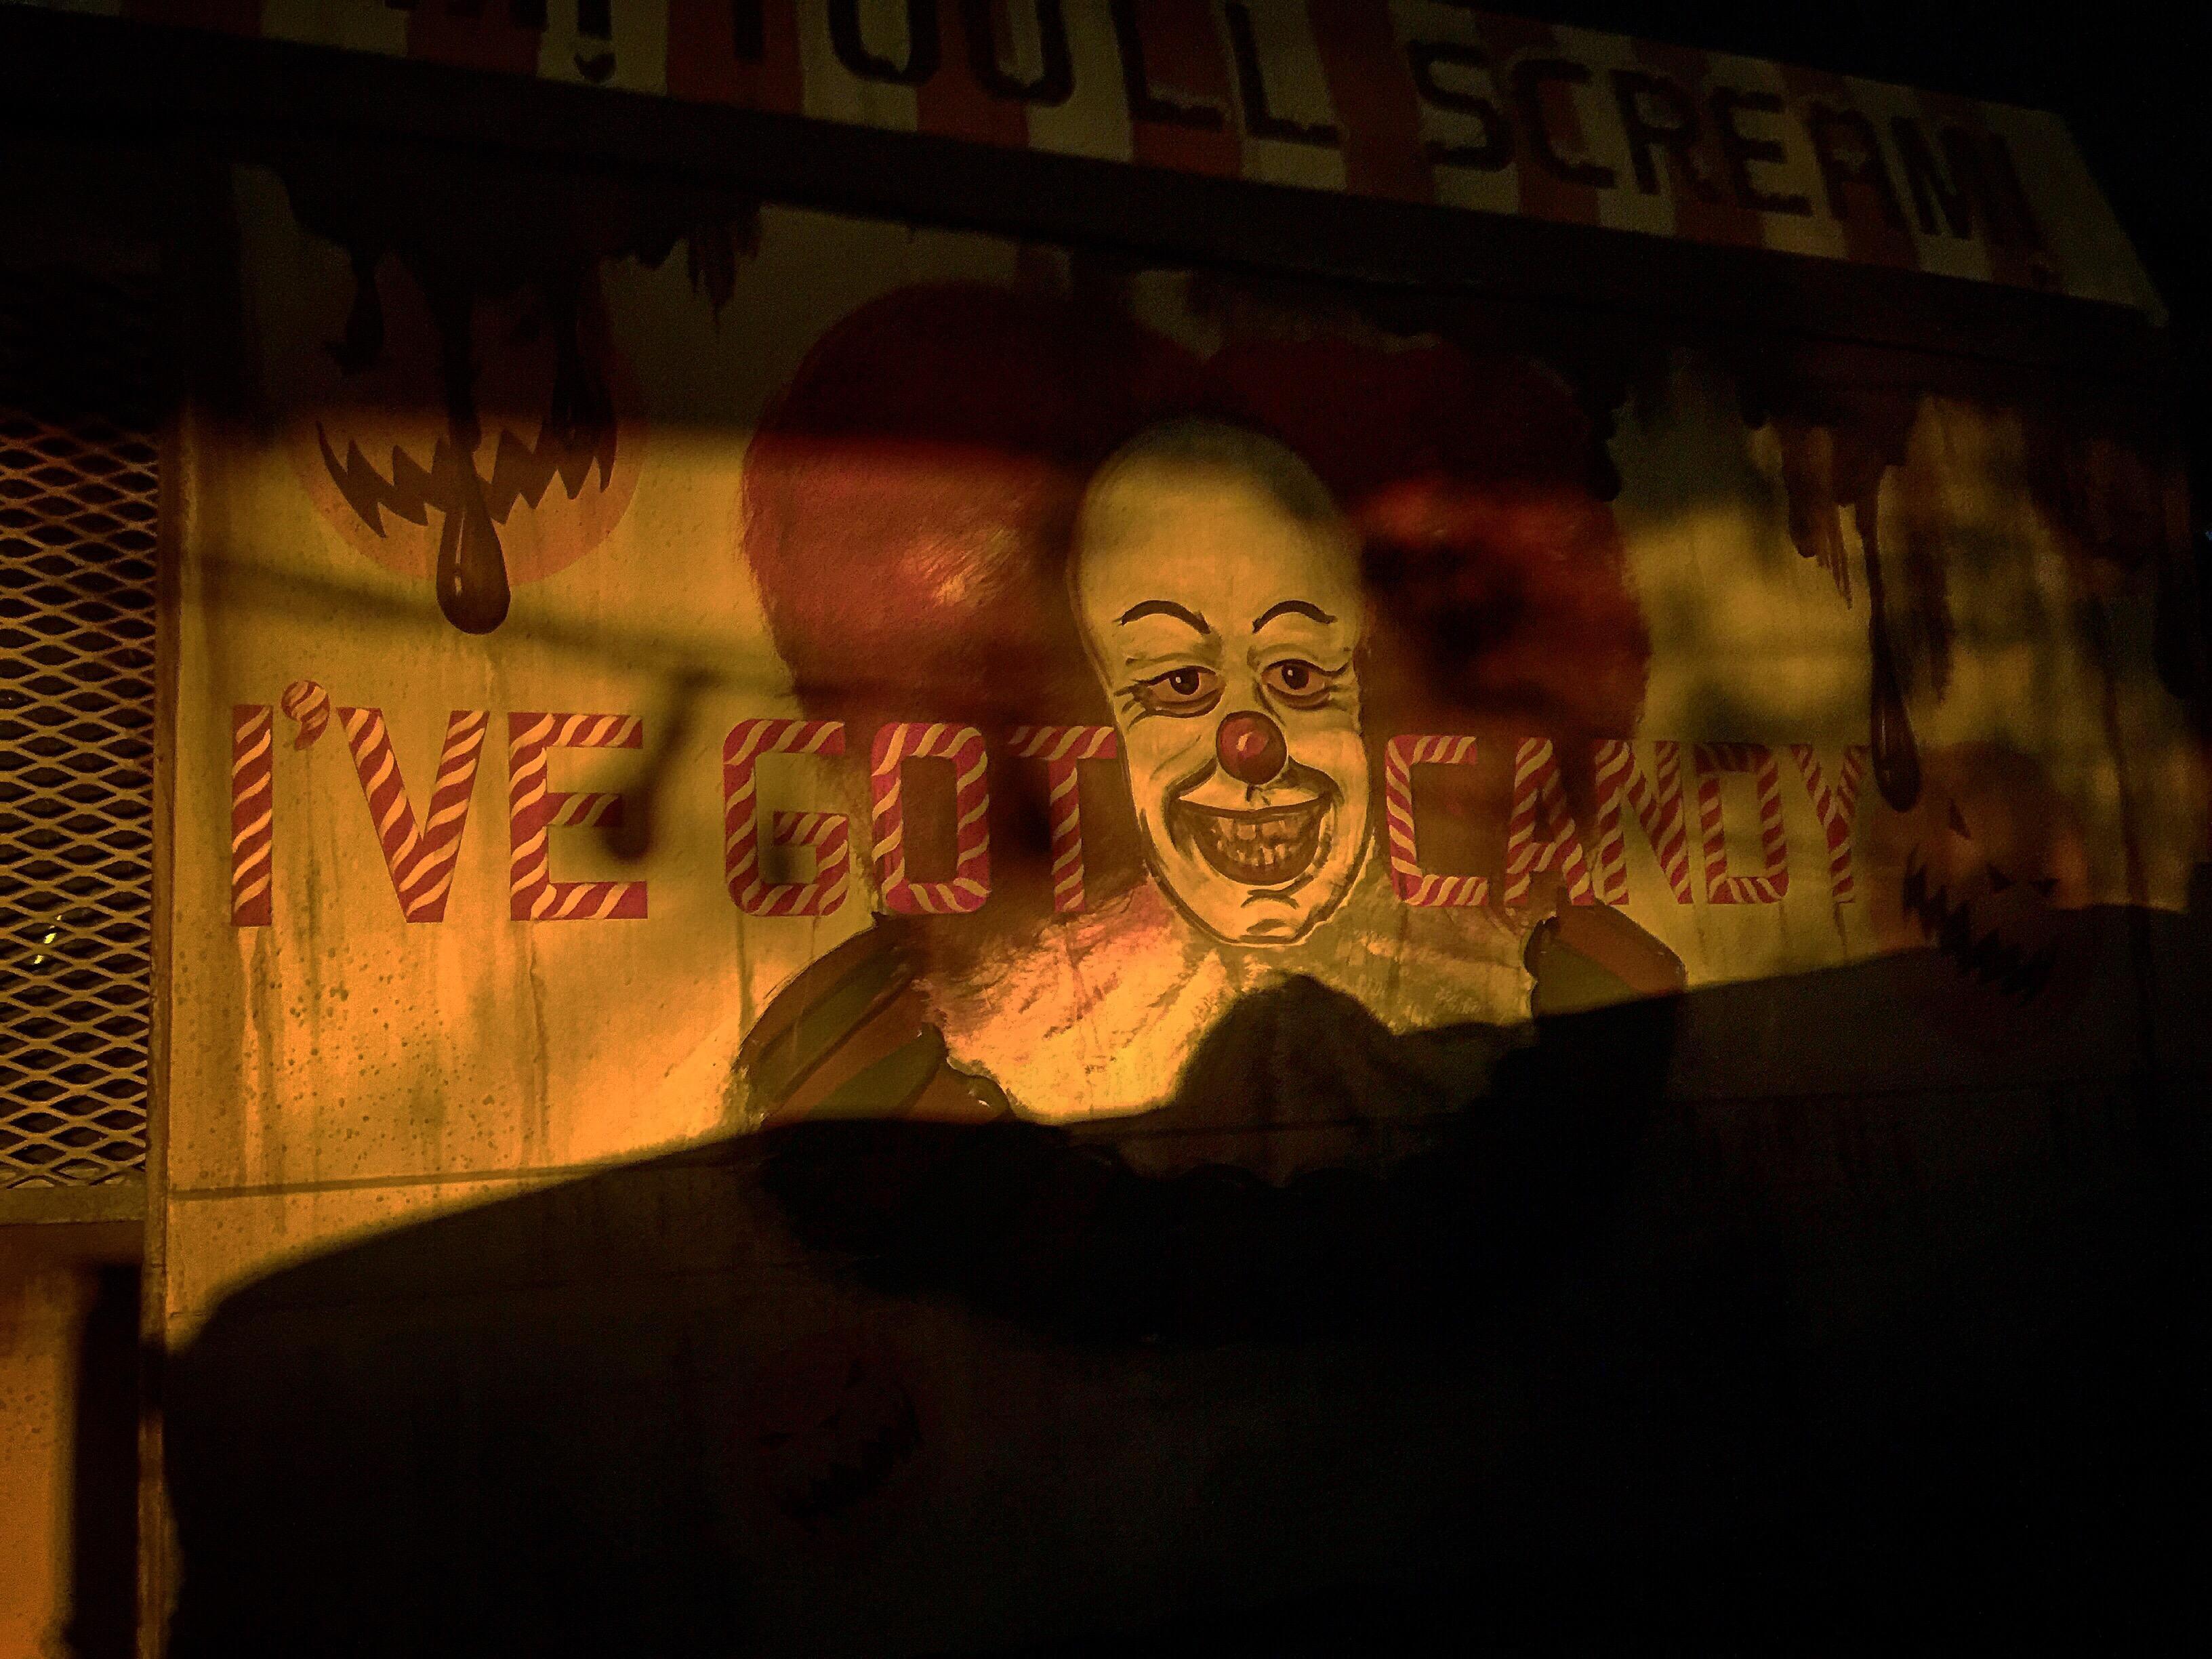 Freak Show Halloween Party